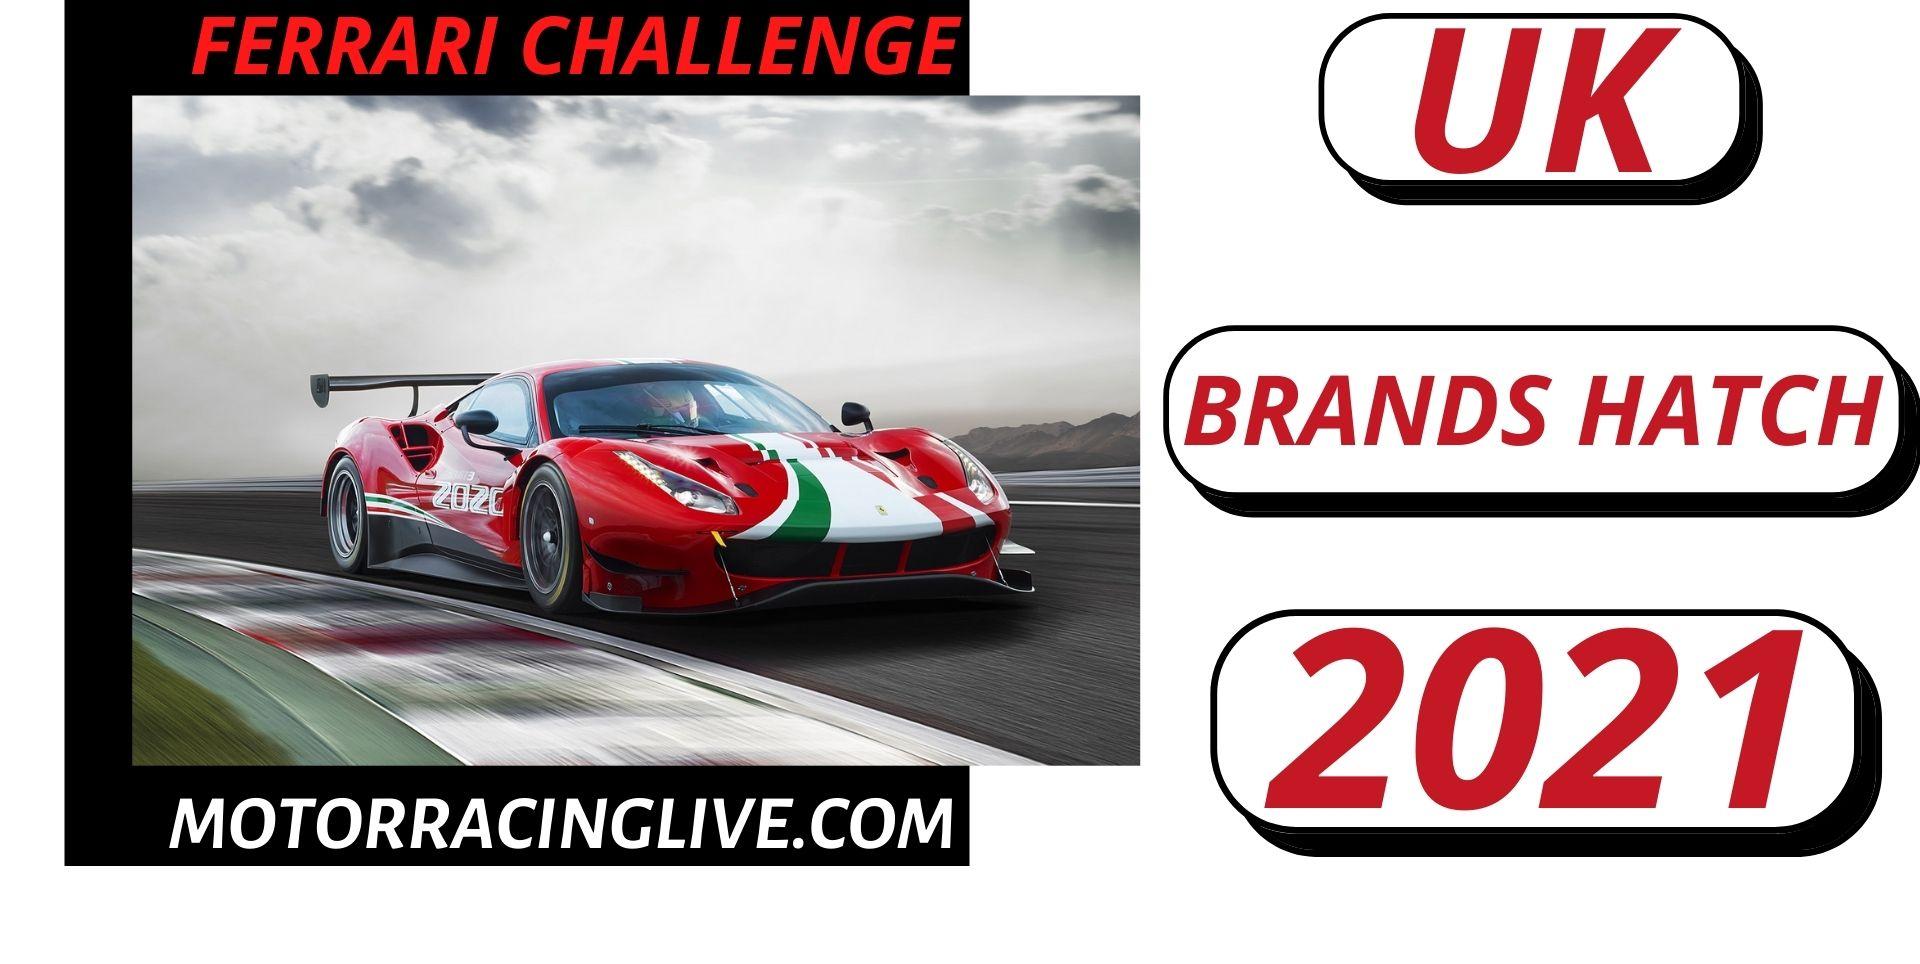 Brands Hatch Ferrari Challenge UK Live Stream 2021